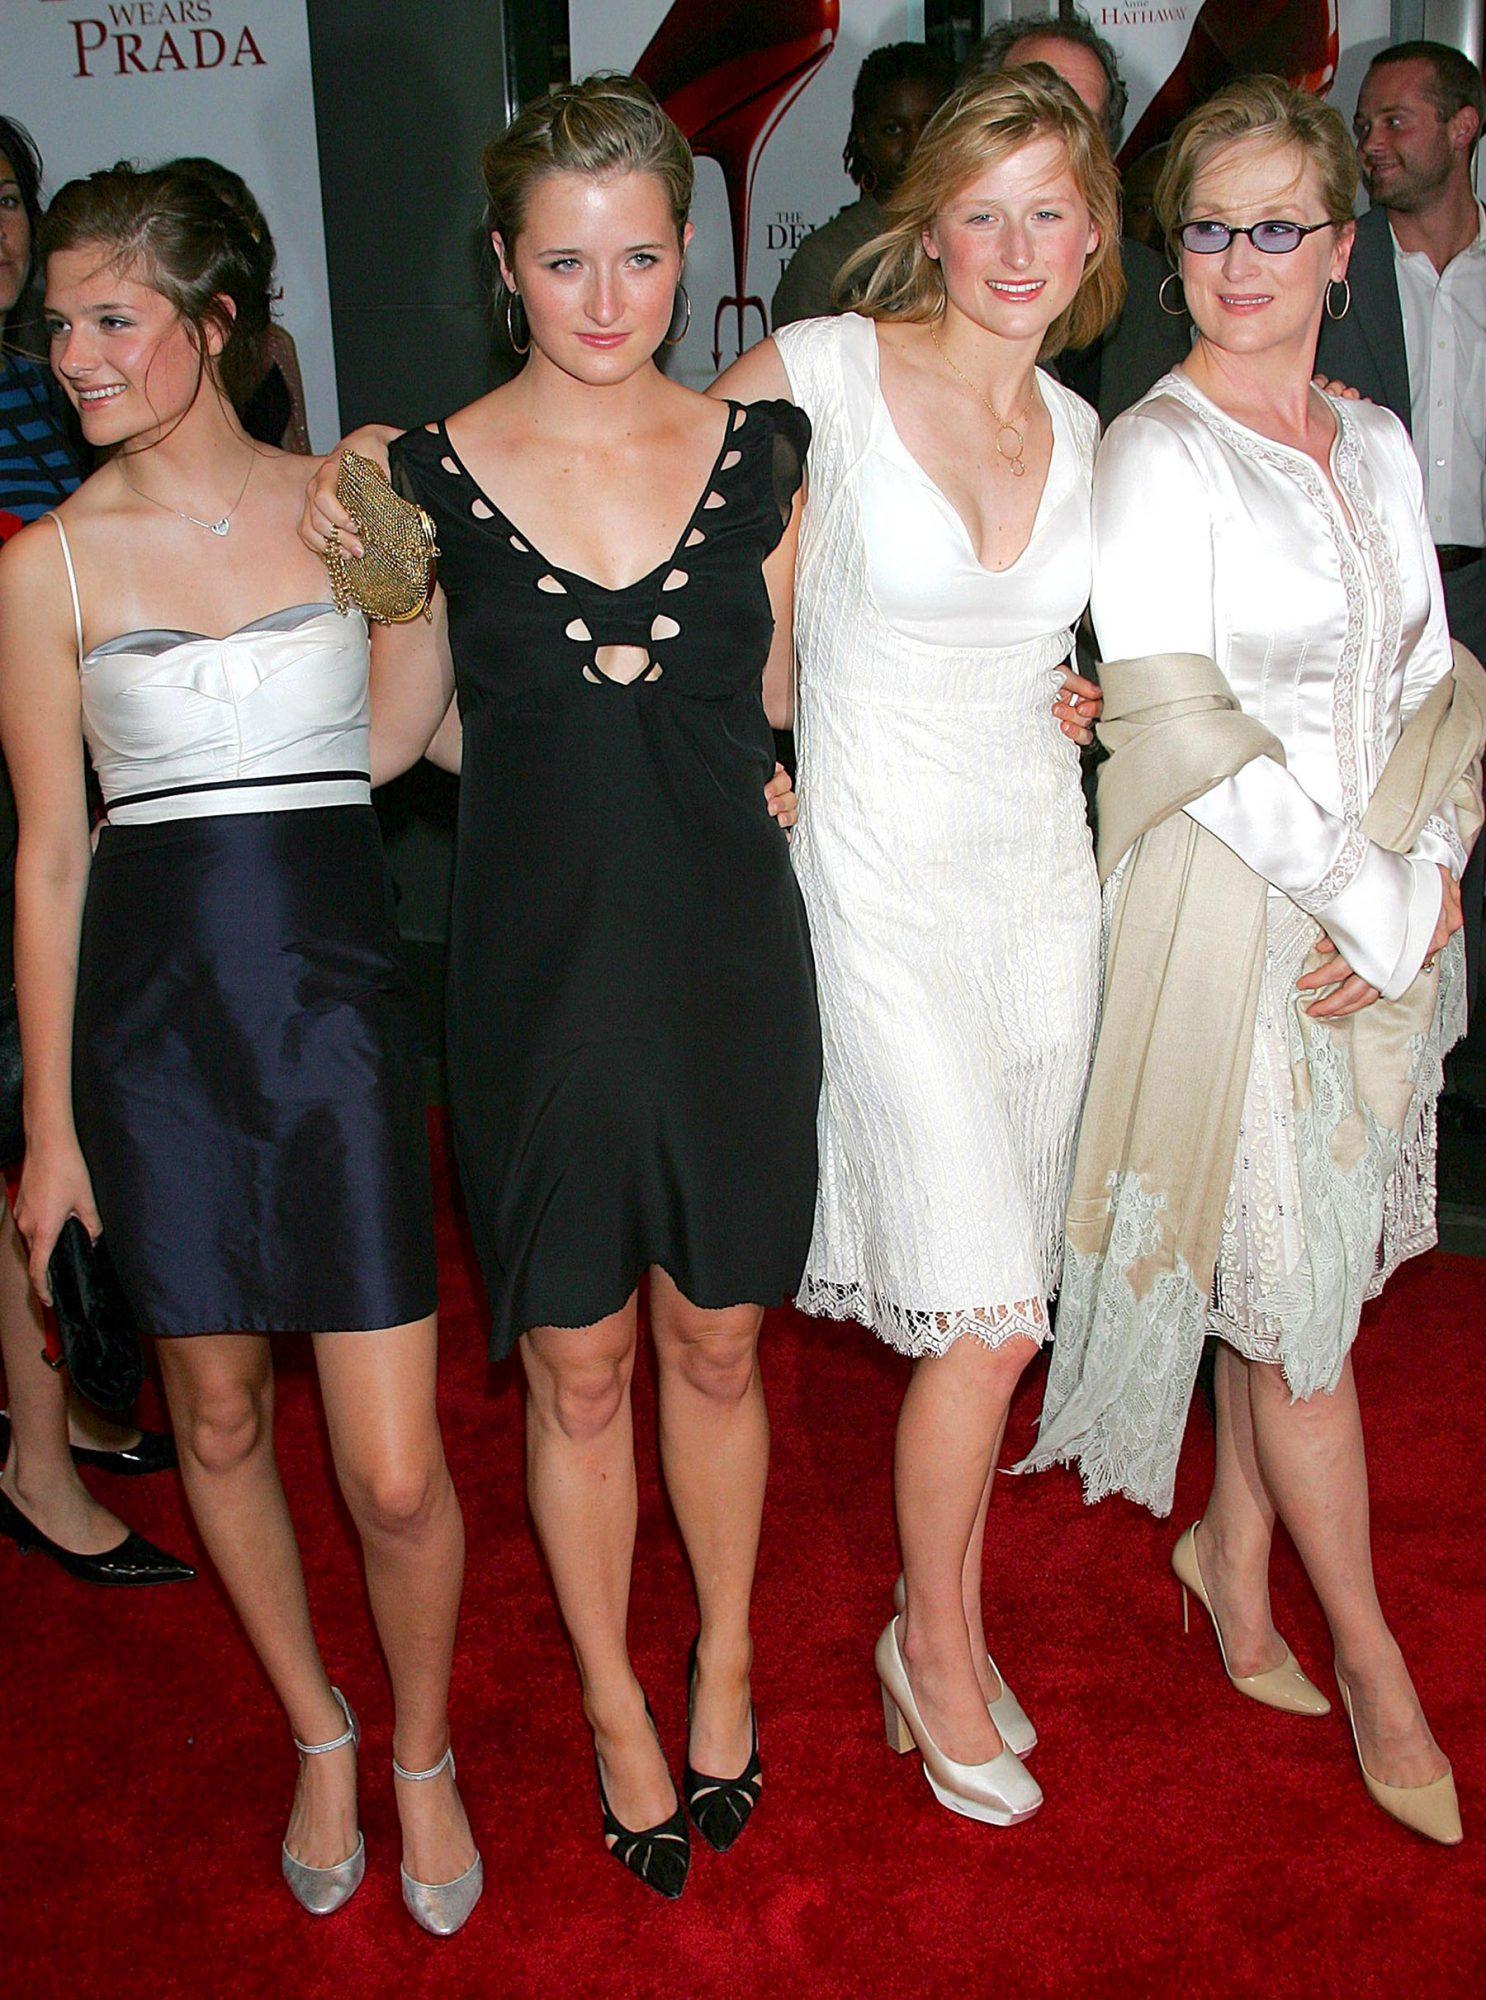 'THE DEVIL WEARS PRADA' FILM PREMIERE PRESENTED BY 20TH CENTURY FOX, NEW YORK, AMERICA - 19 JUN 2006